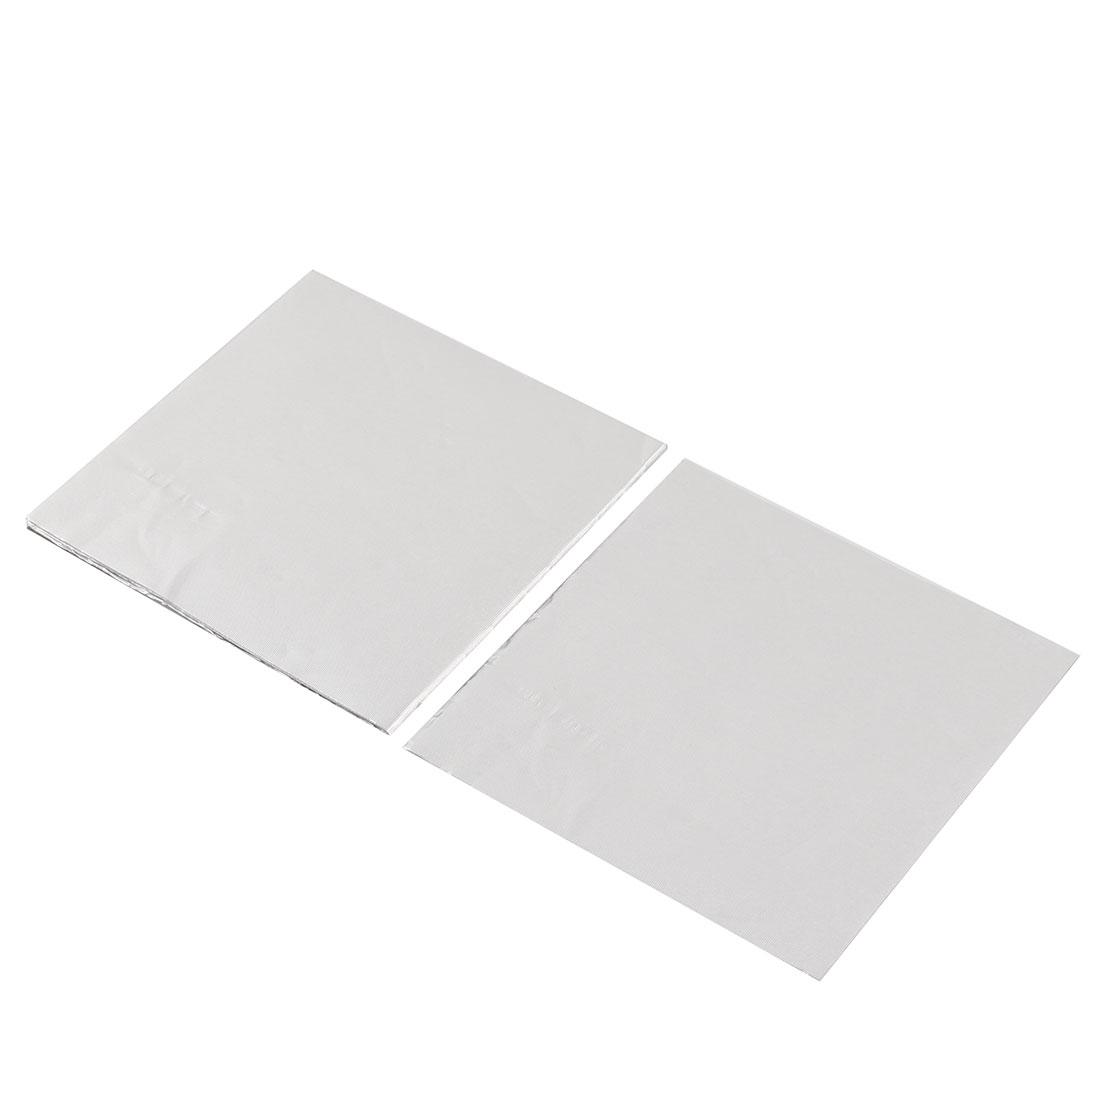 Cuisson Aluminium Chocolat Bonbons Wrappers Papier Aluminium 8 x 8cm 100pcs - image 3 de 3